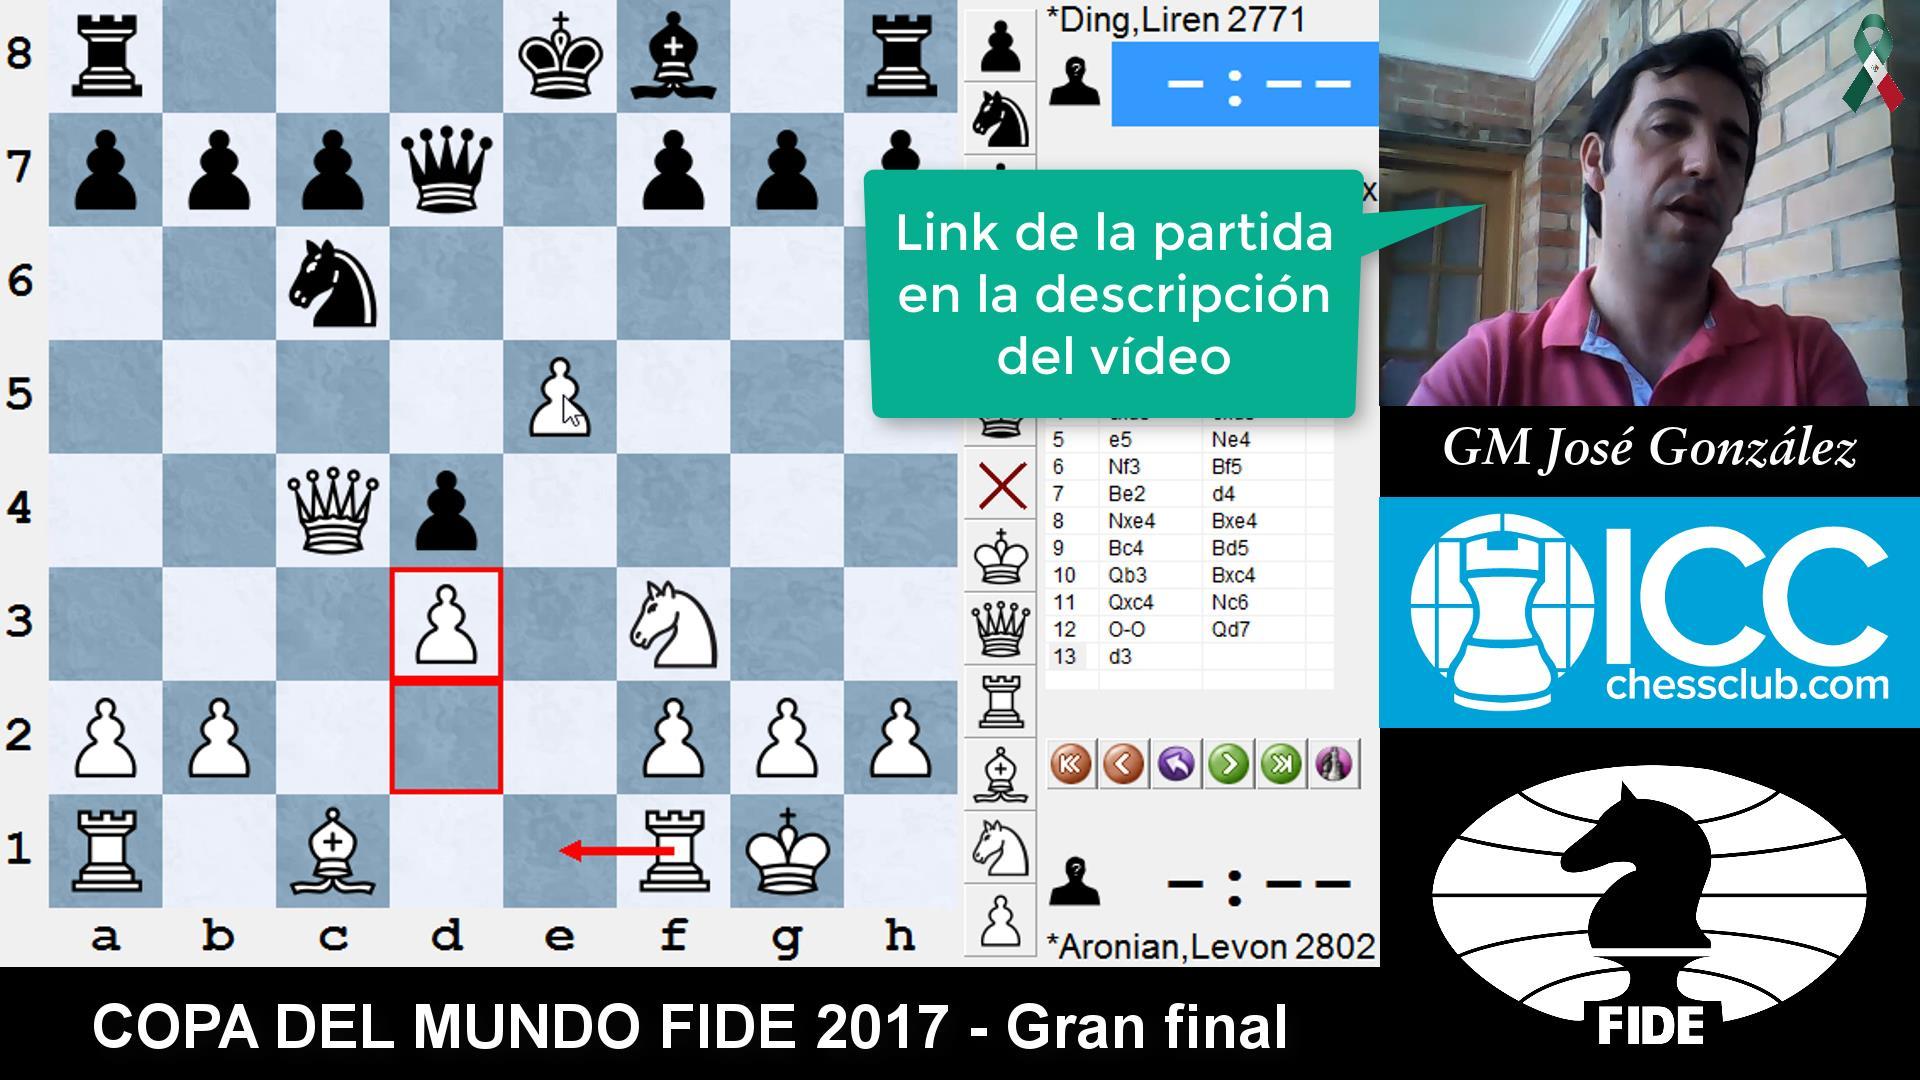 COPA DEL MUNDO FIDE 2017 - Resumen de la final (GM José González)